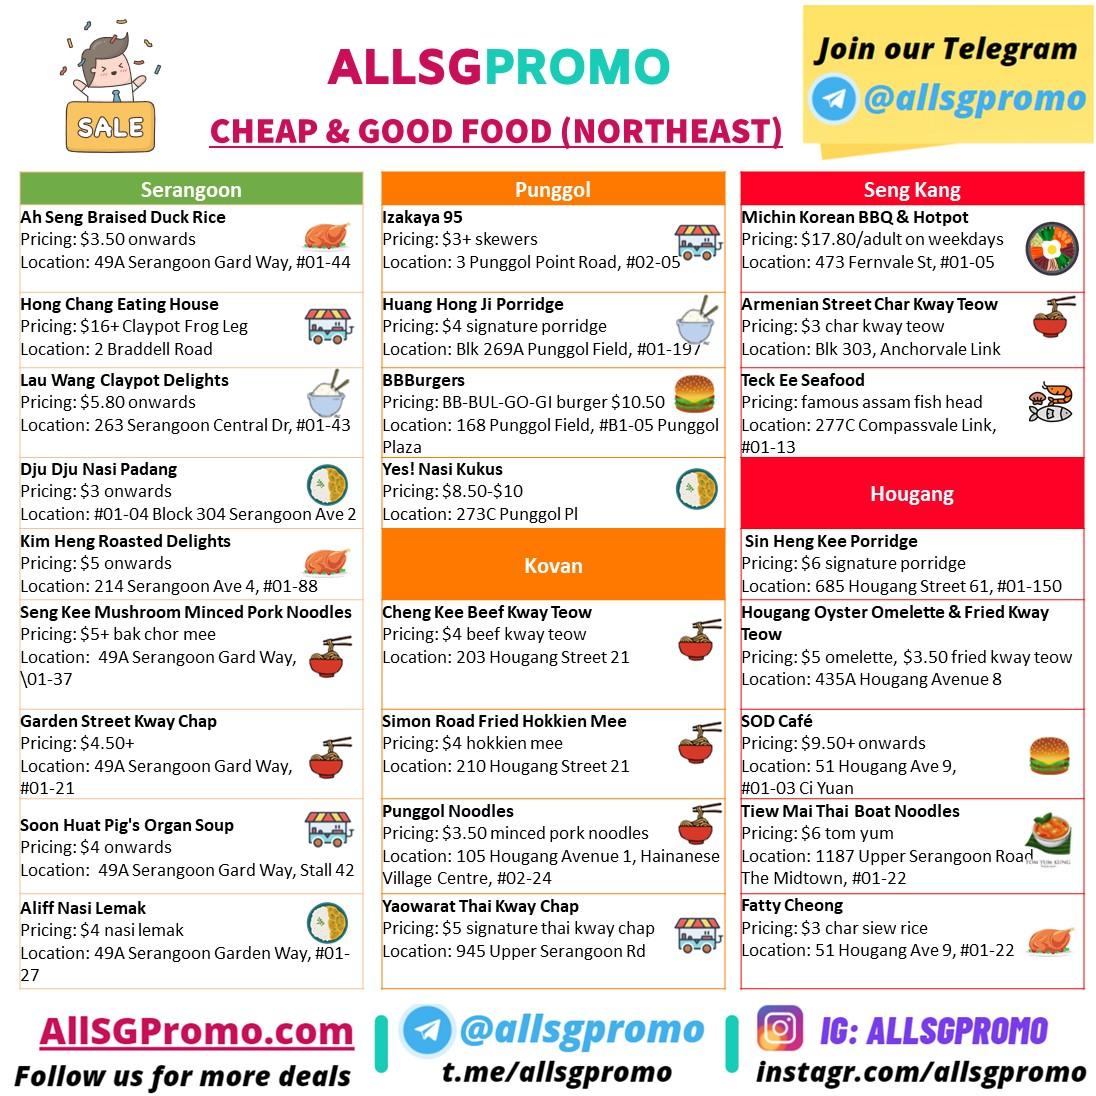 cheap and good food cheatsheet northeast